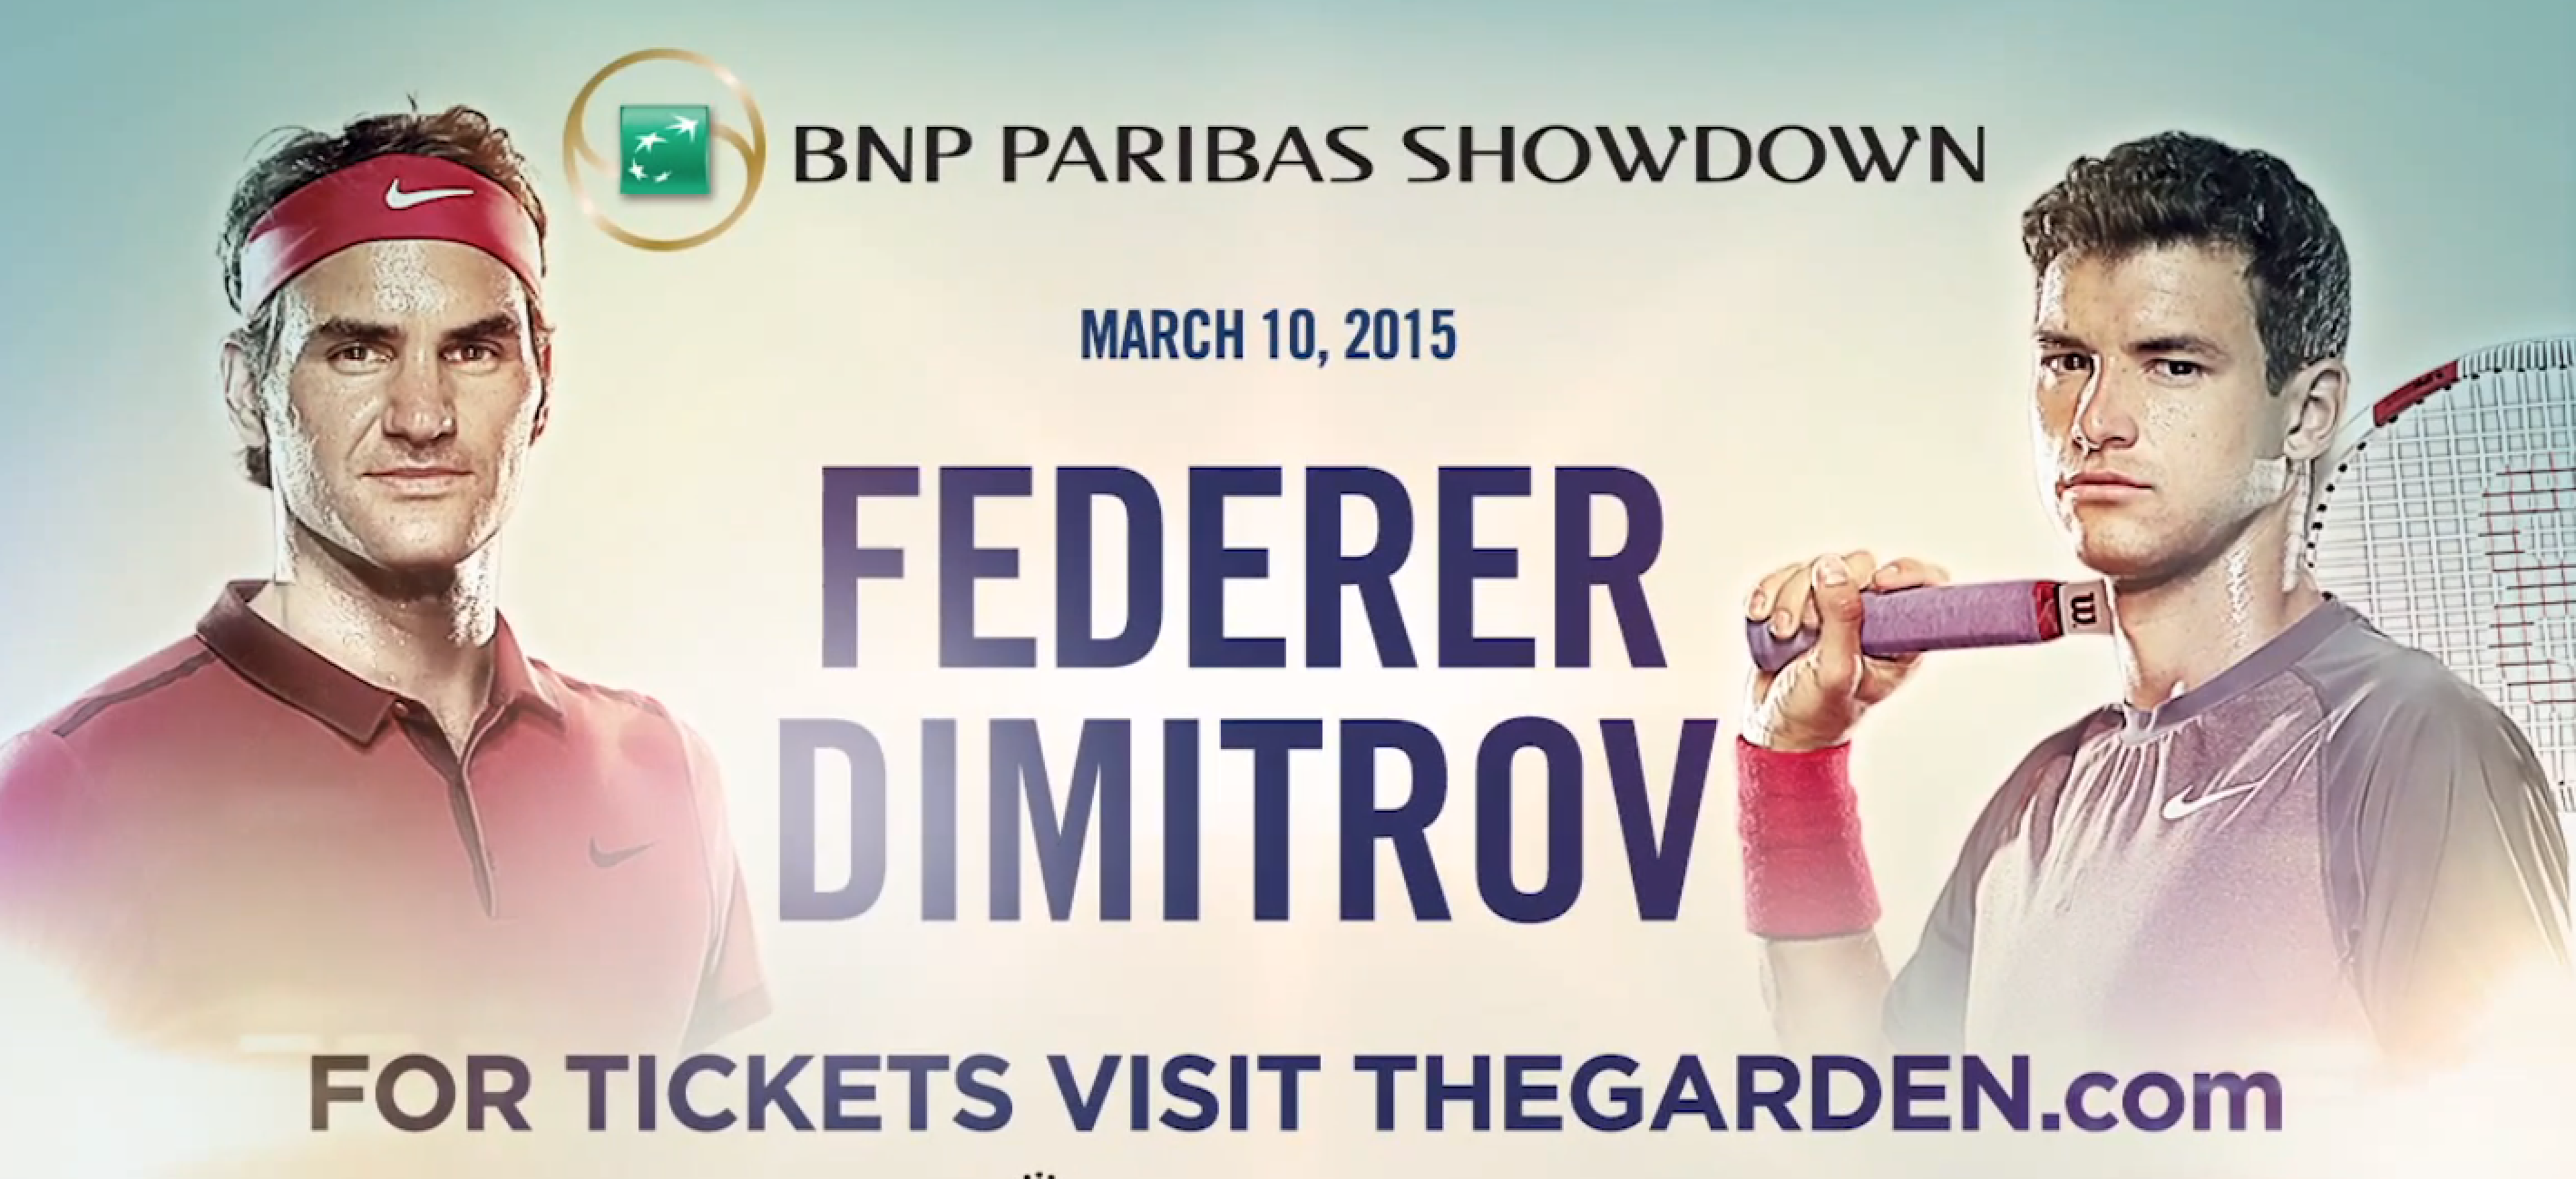 Federer Dimitrov BNP Paribas Showdown 2015